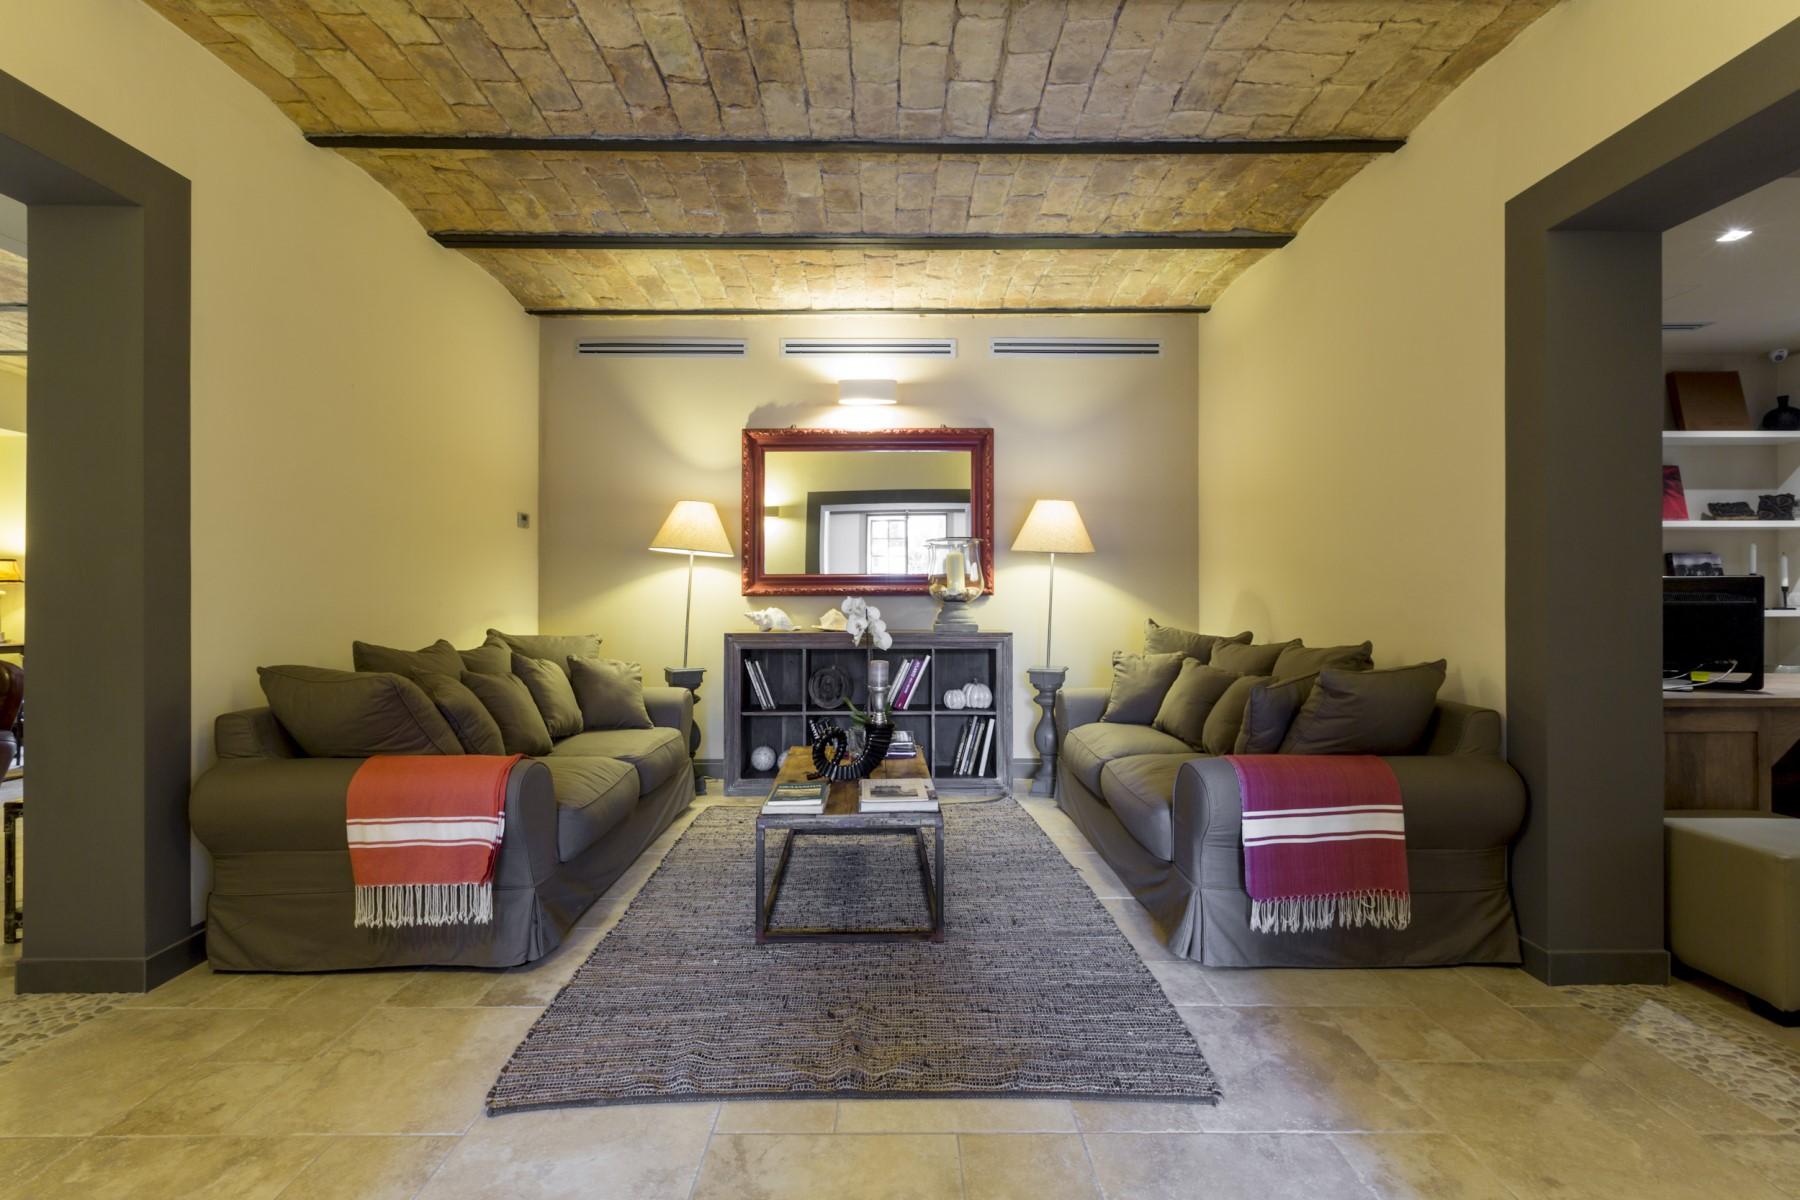 Ingresso Hotel 900 Giulianova Abruzzo Charme 4 stelle star Luxury Business Leisure Vacanza